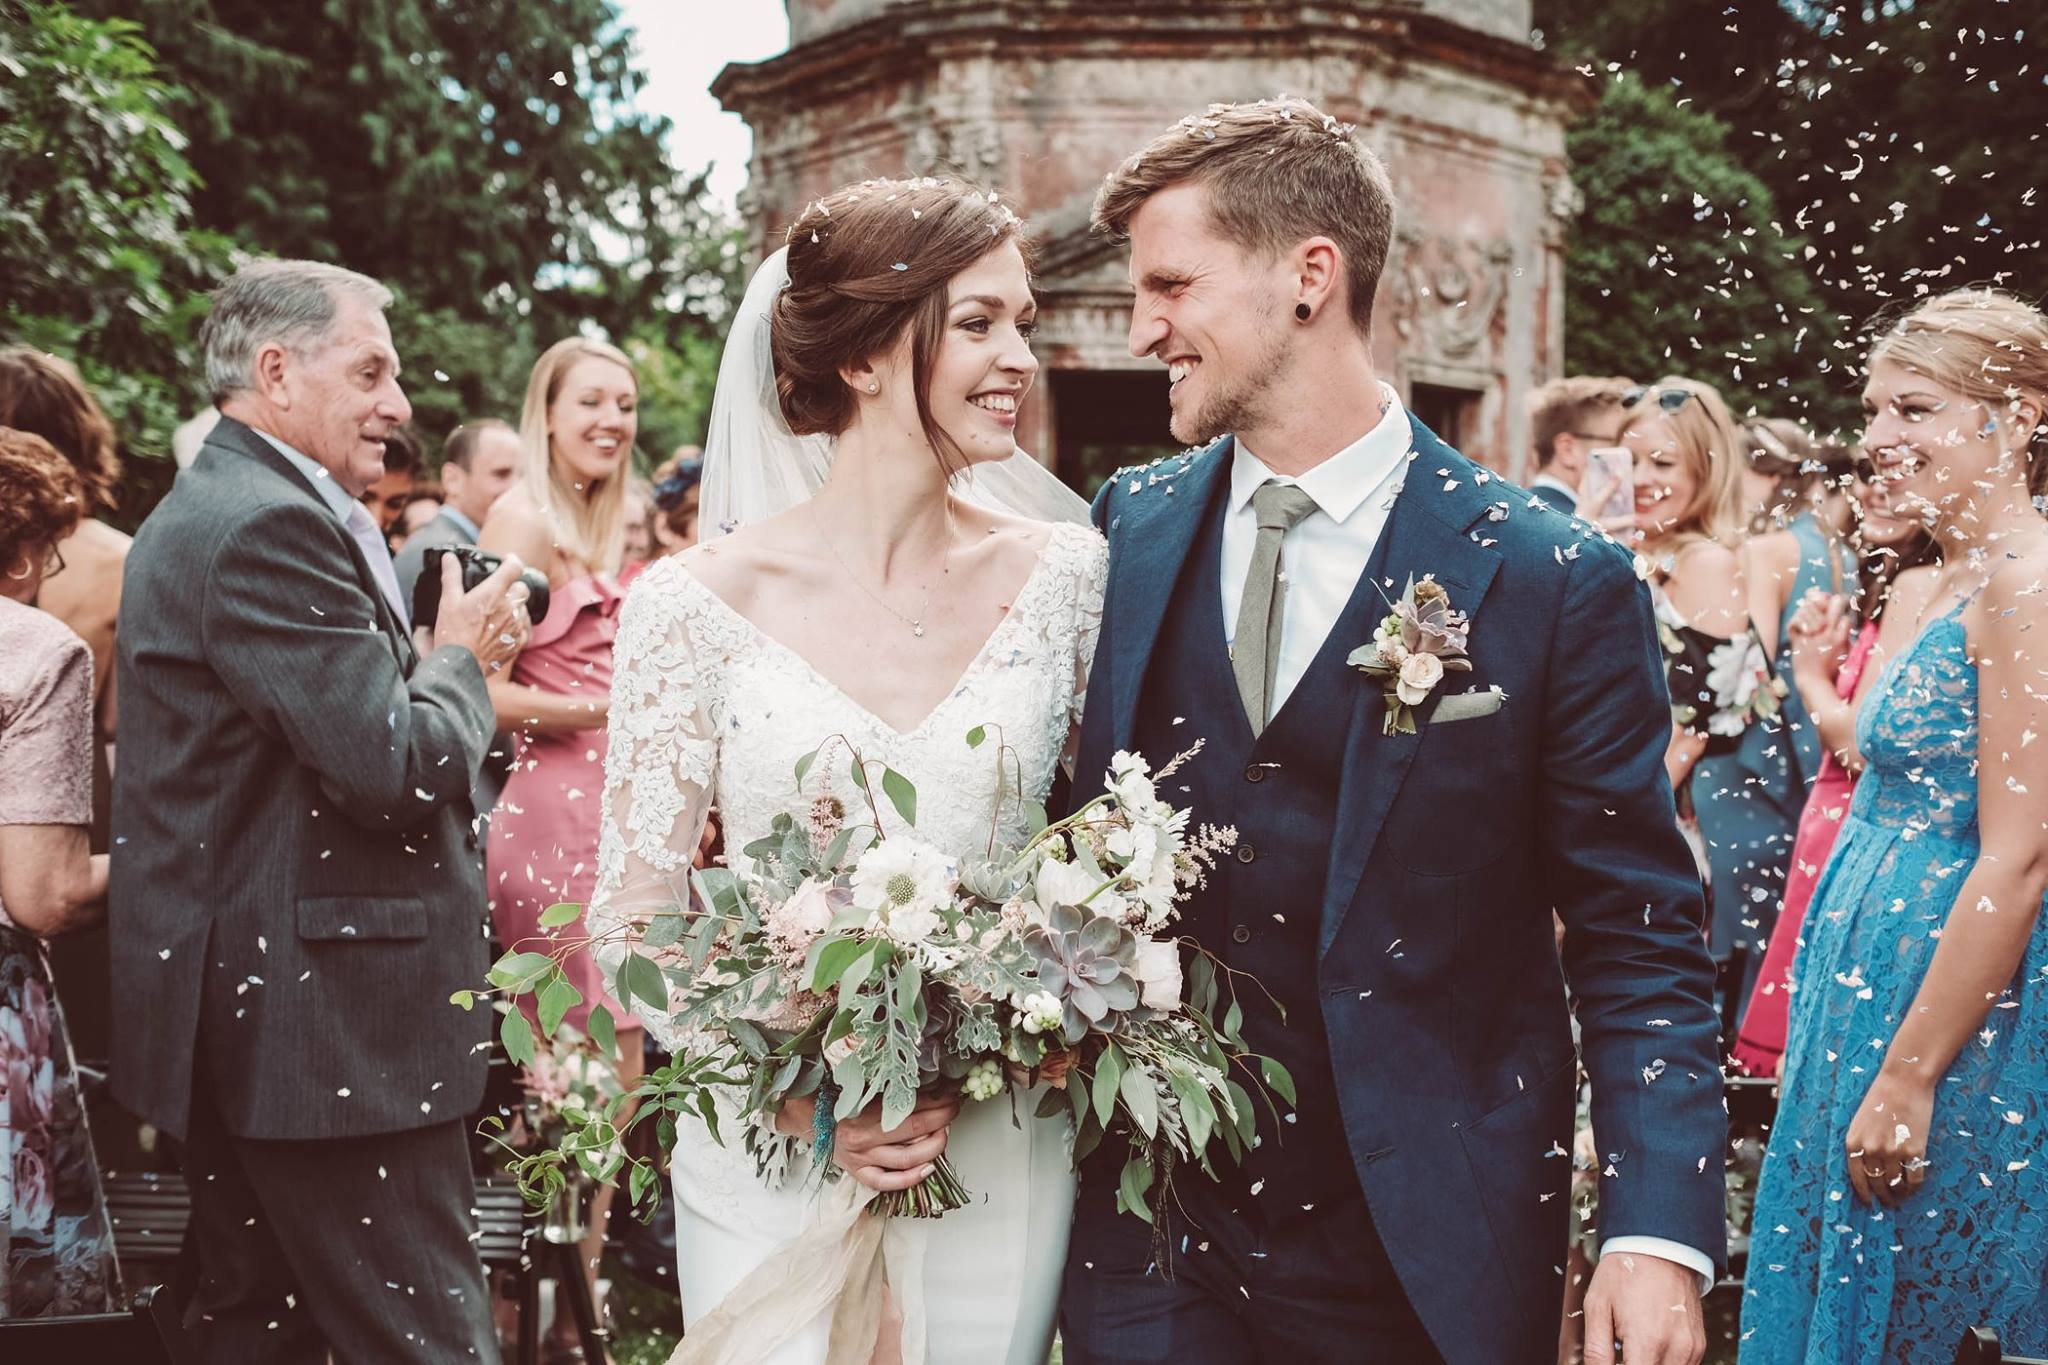 Jake & Faye's Wedding Credit:  Lemonade Pictures